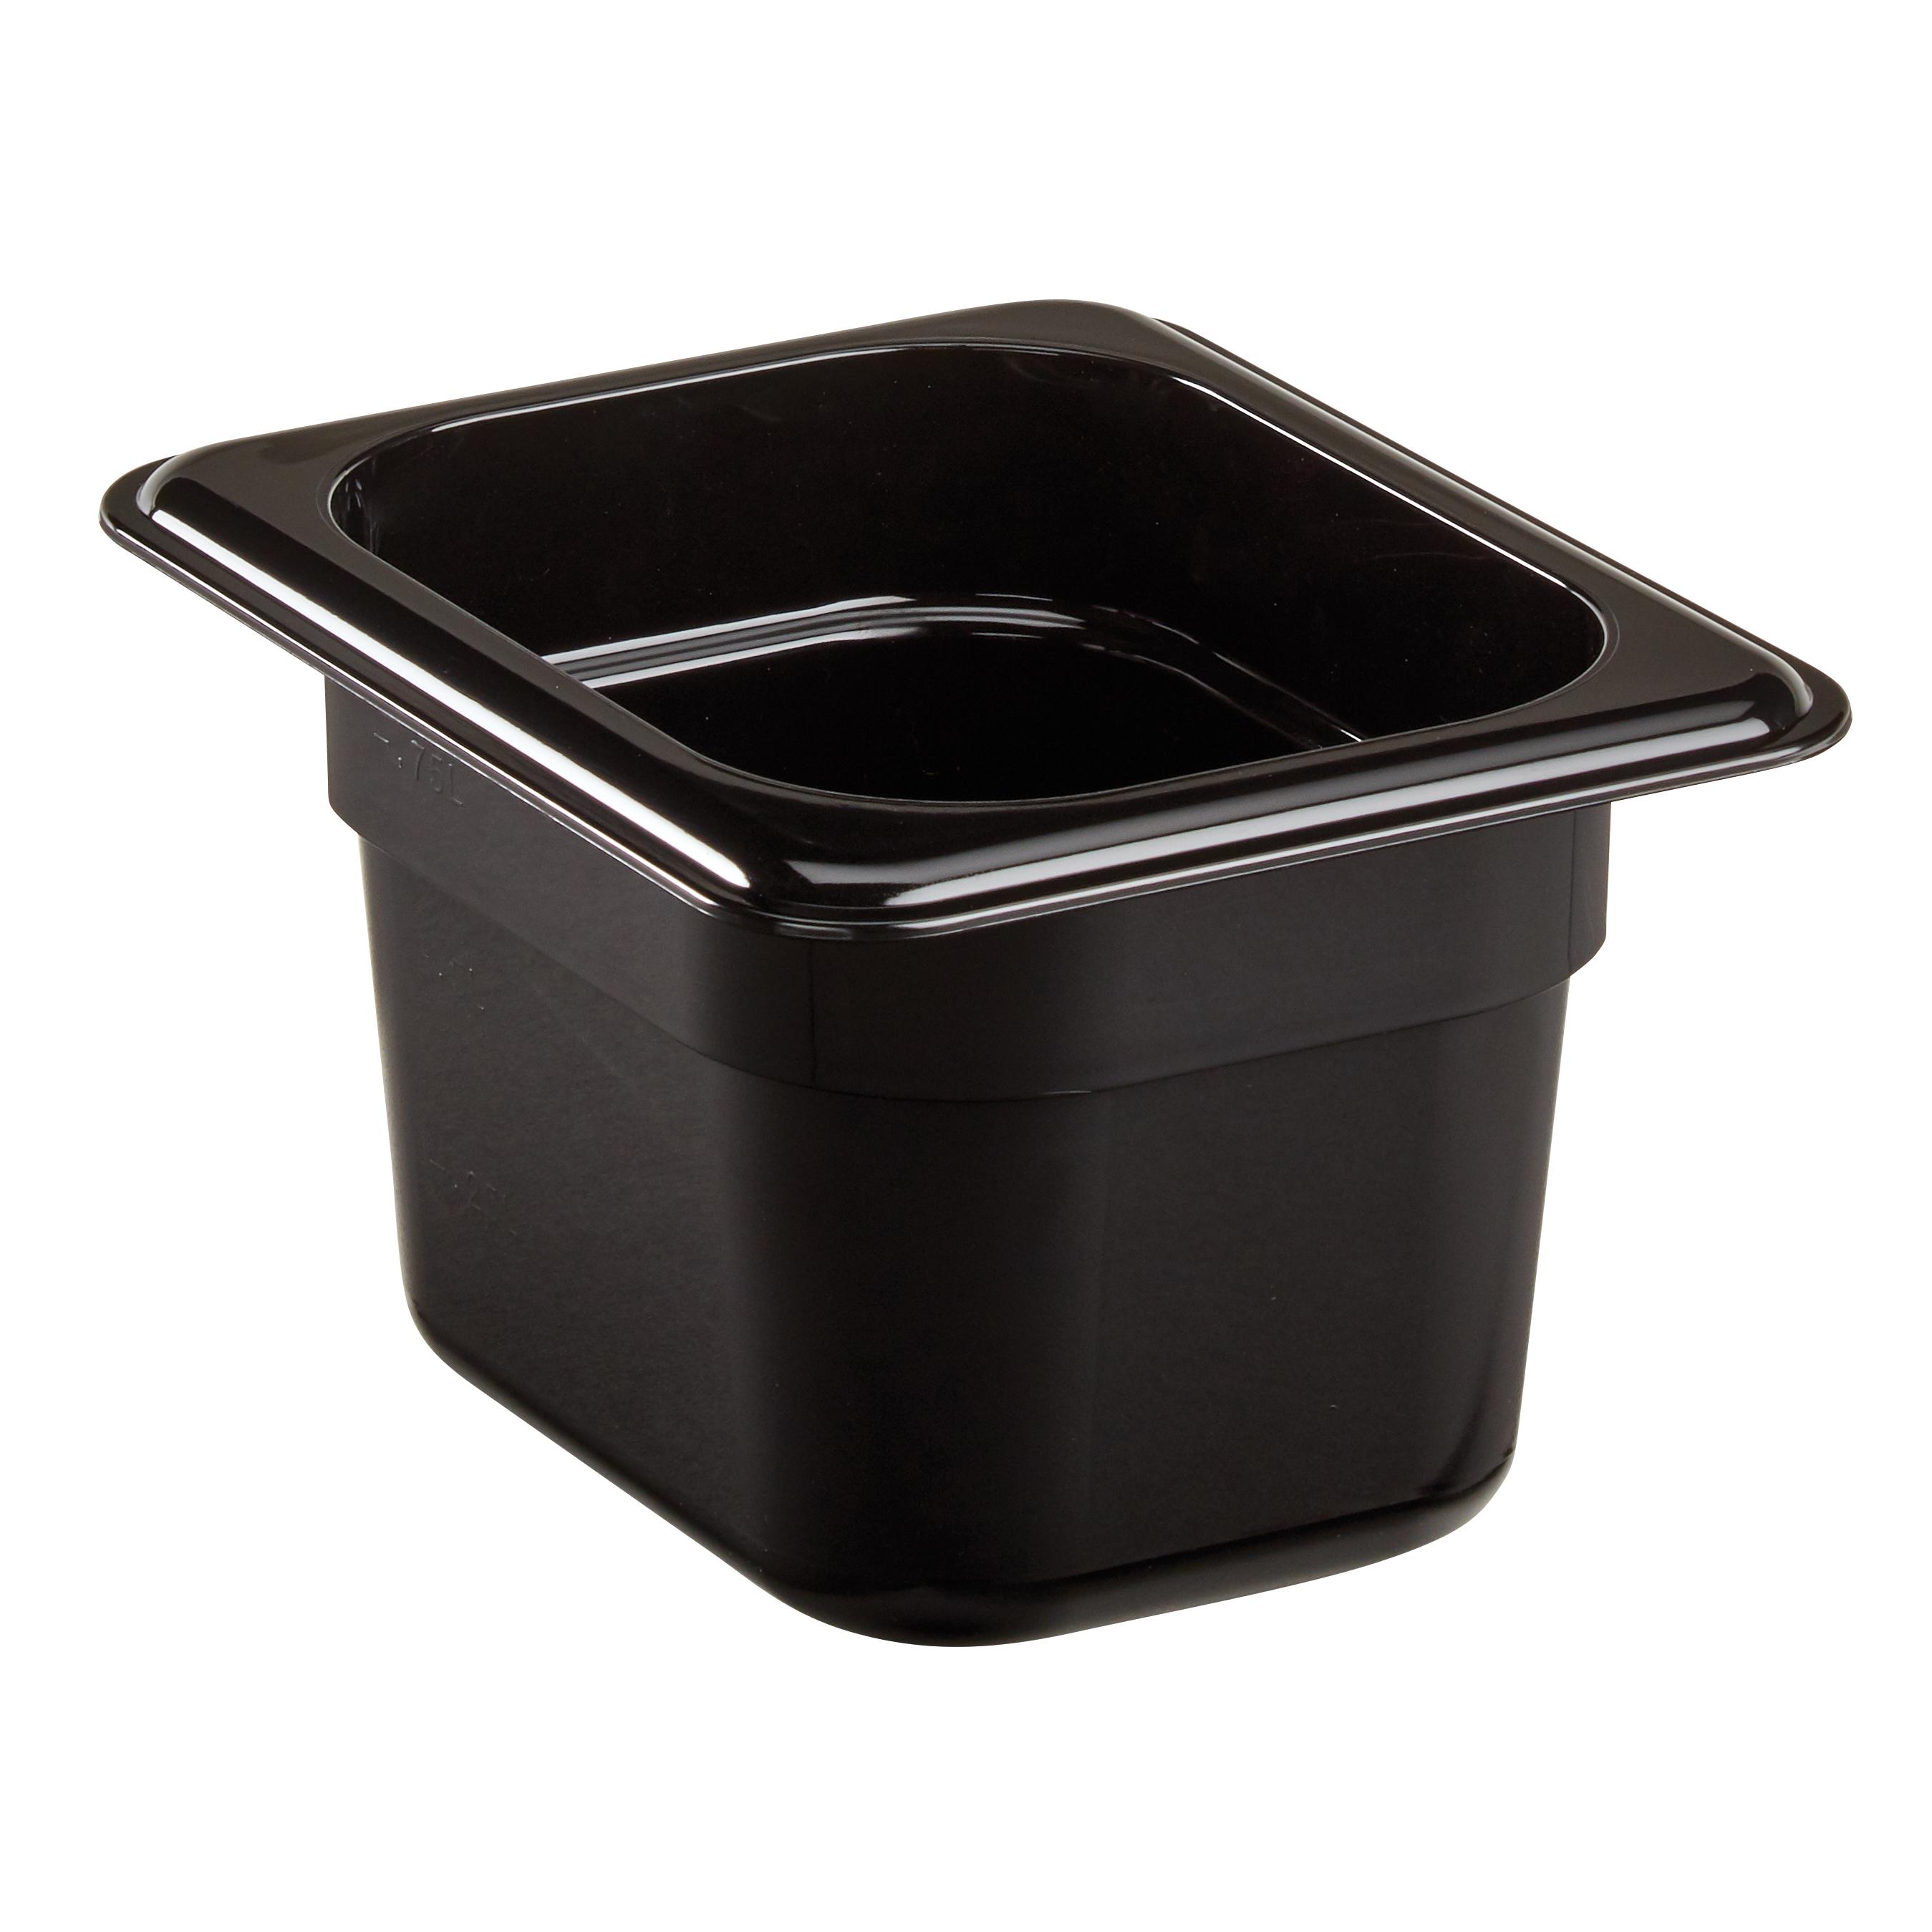 Cambro 84CW110 food/beverage storage container